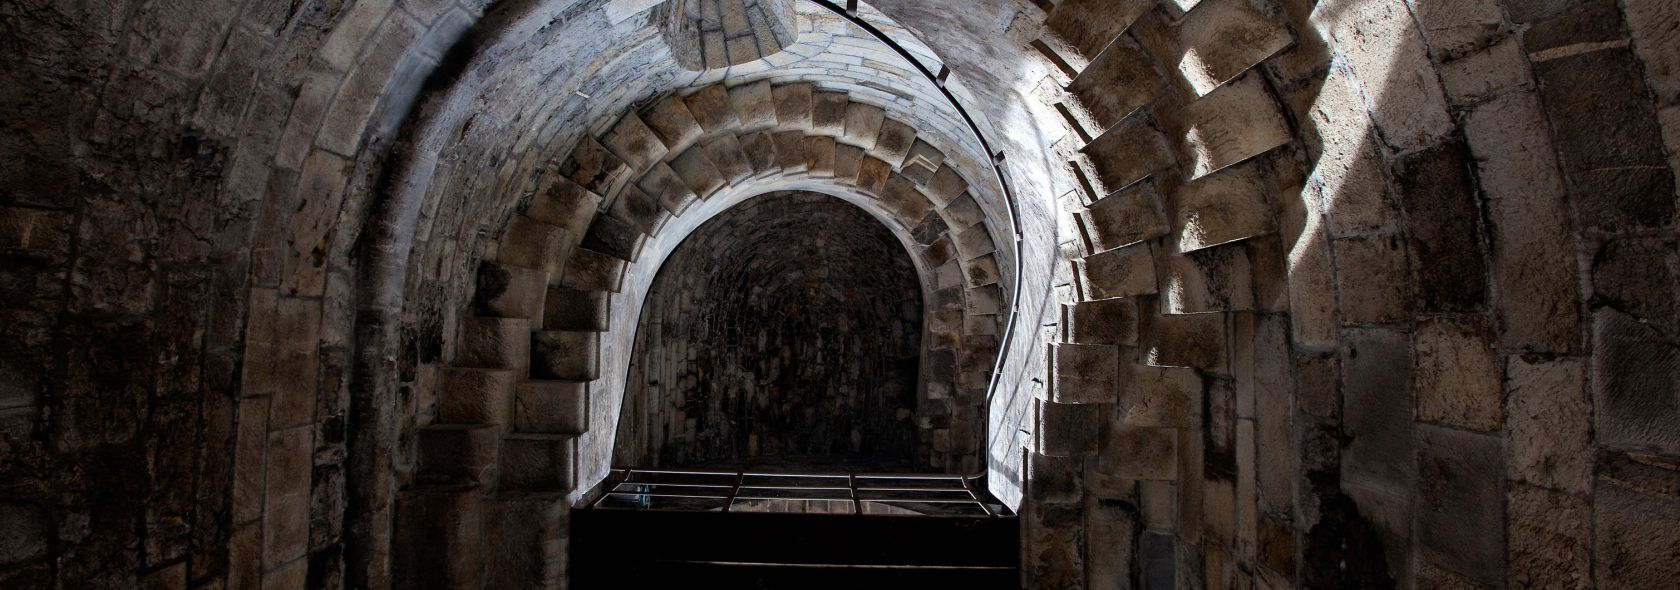 Porta Soprana - foto: Stefanogoldberg - ©publifoto